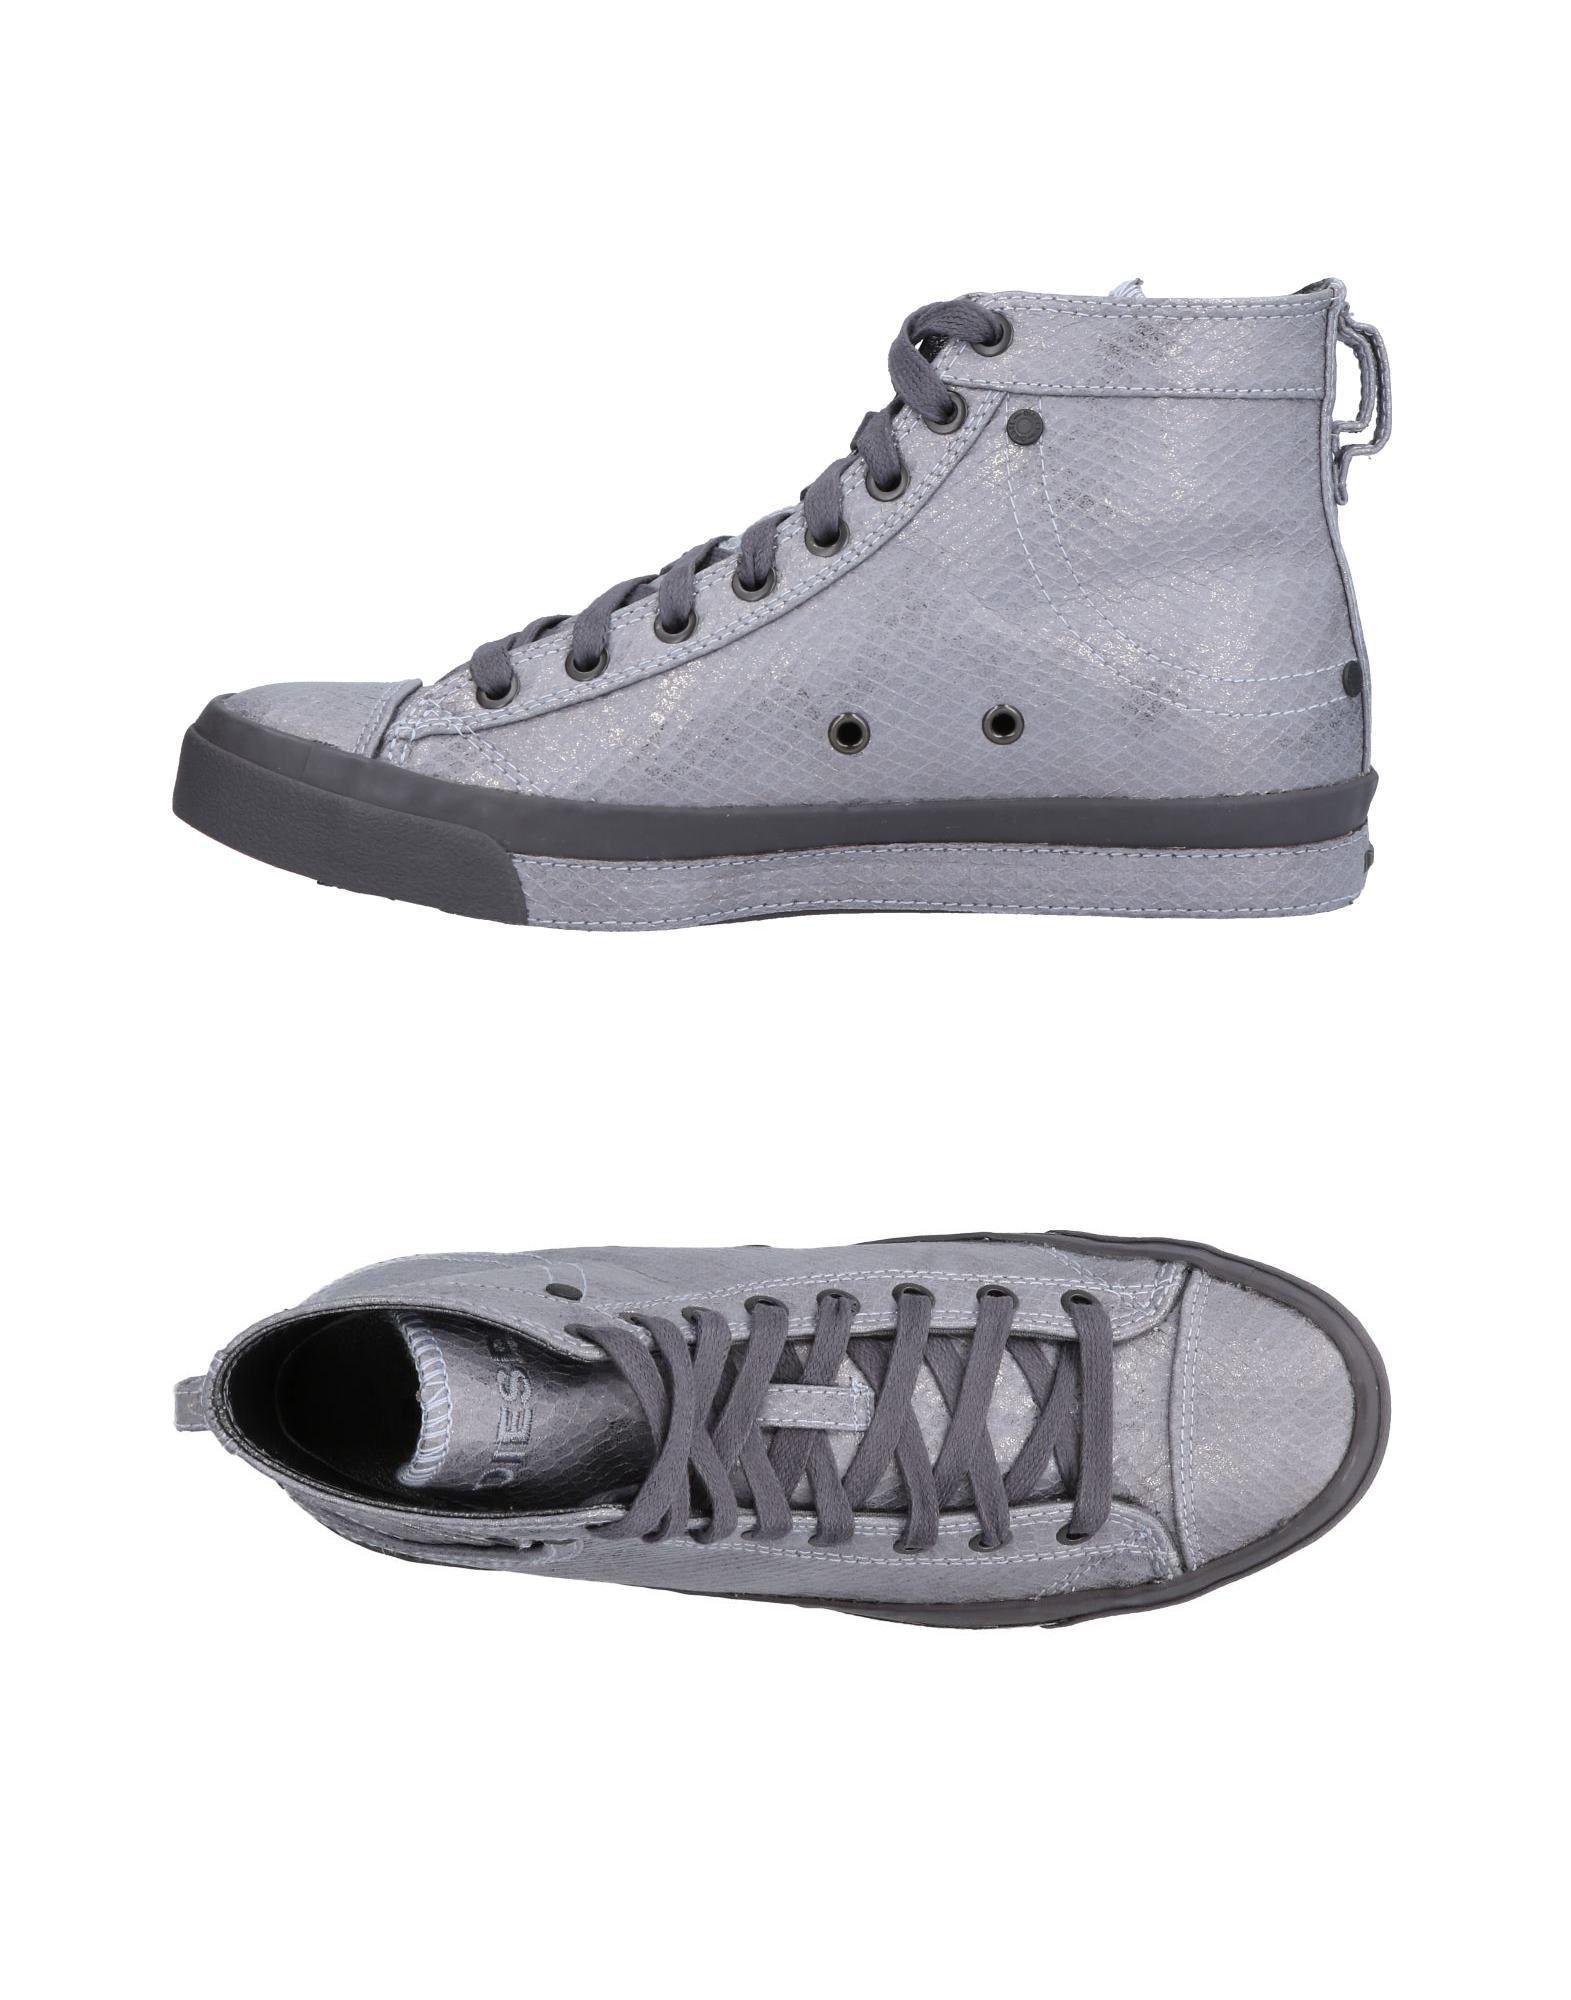 Diesel Sneakers Damen  11491243RO Gute Qualität beliebte Schuhe